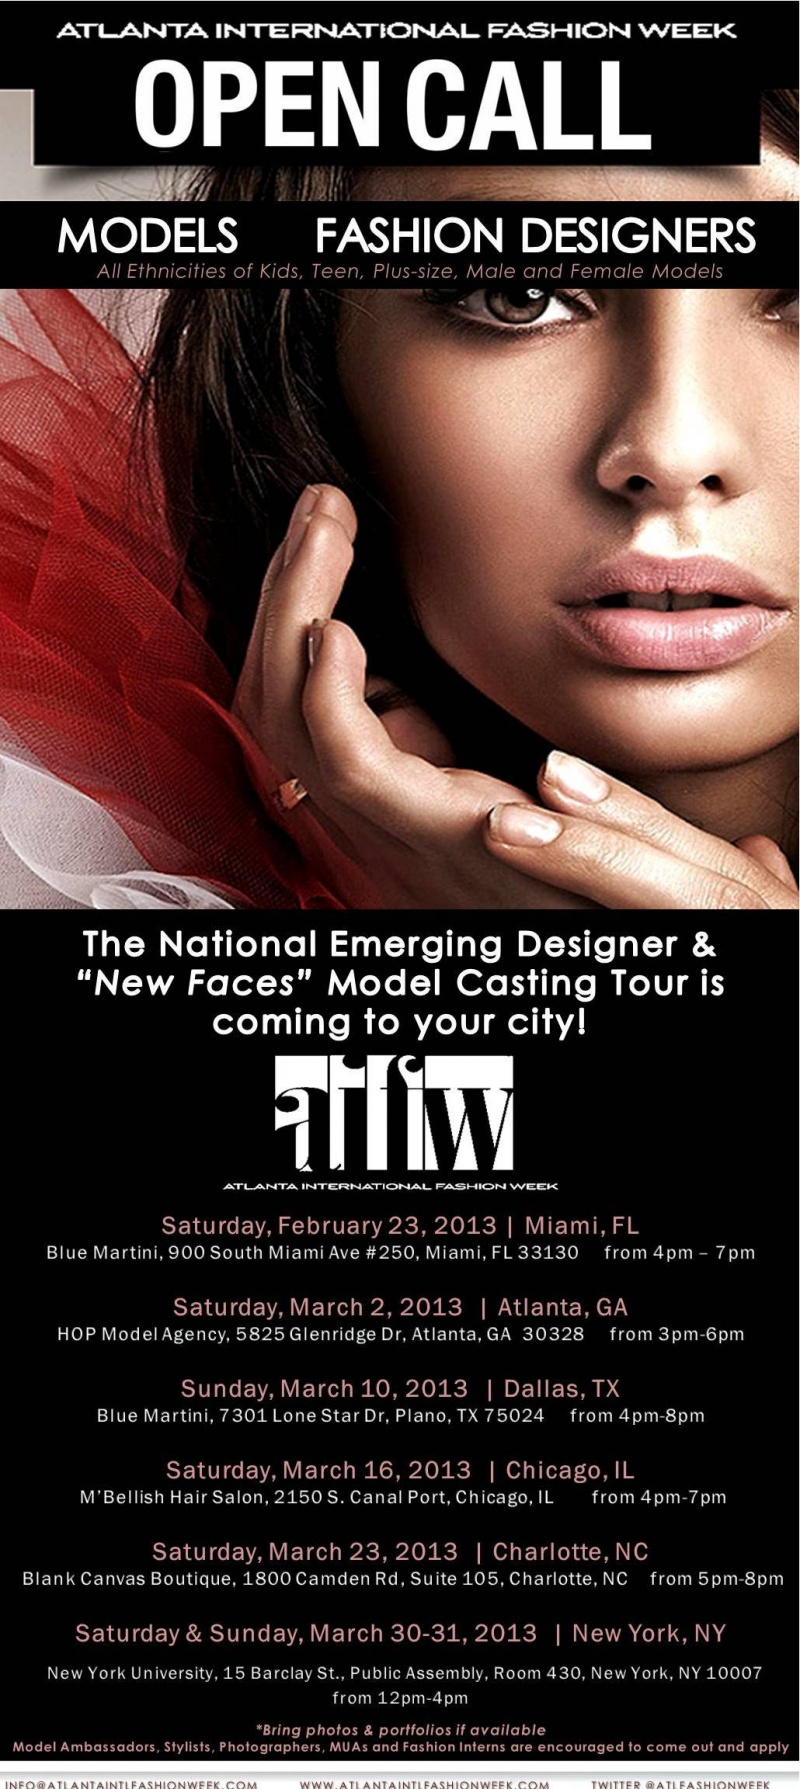 Atlanta International Fashion Week Open Call